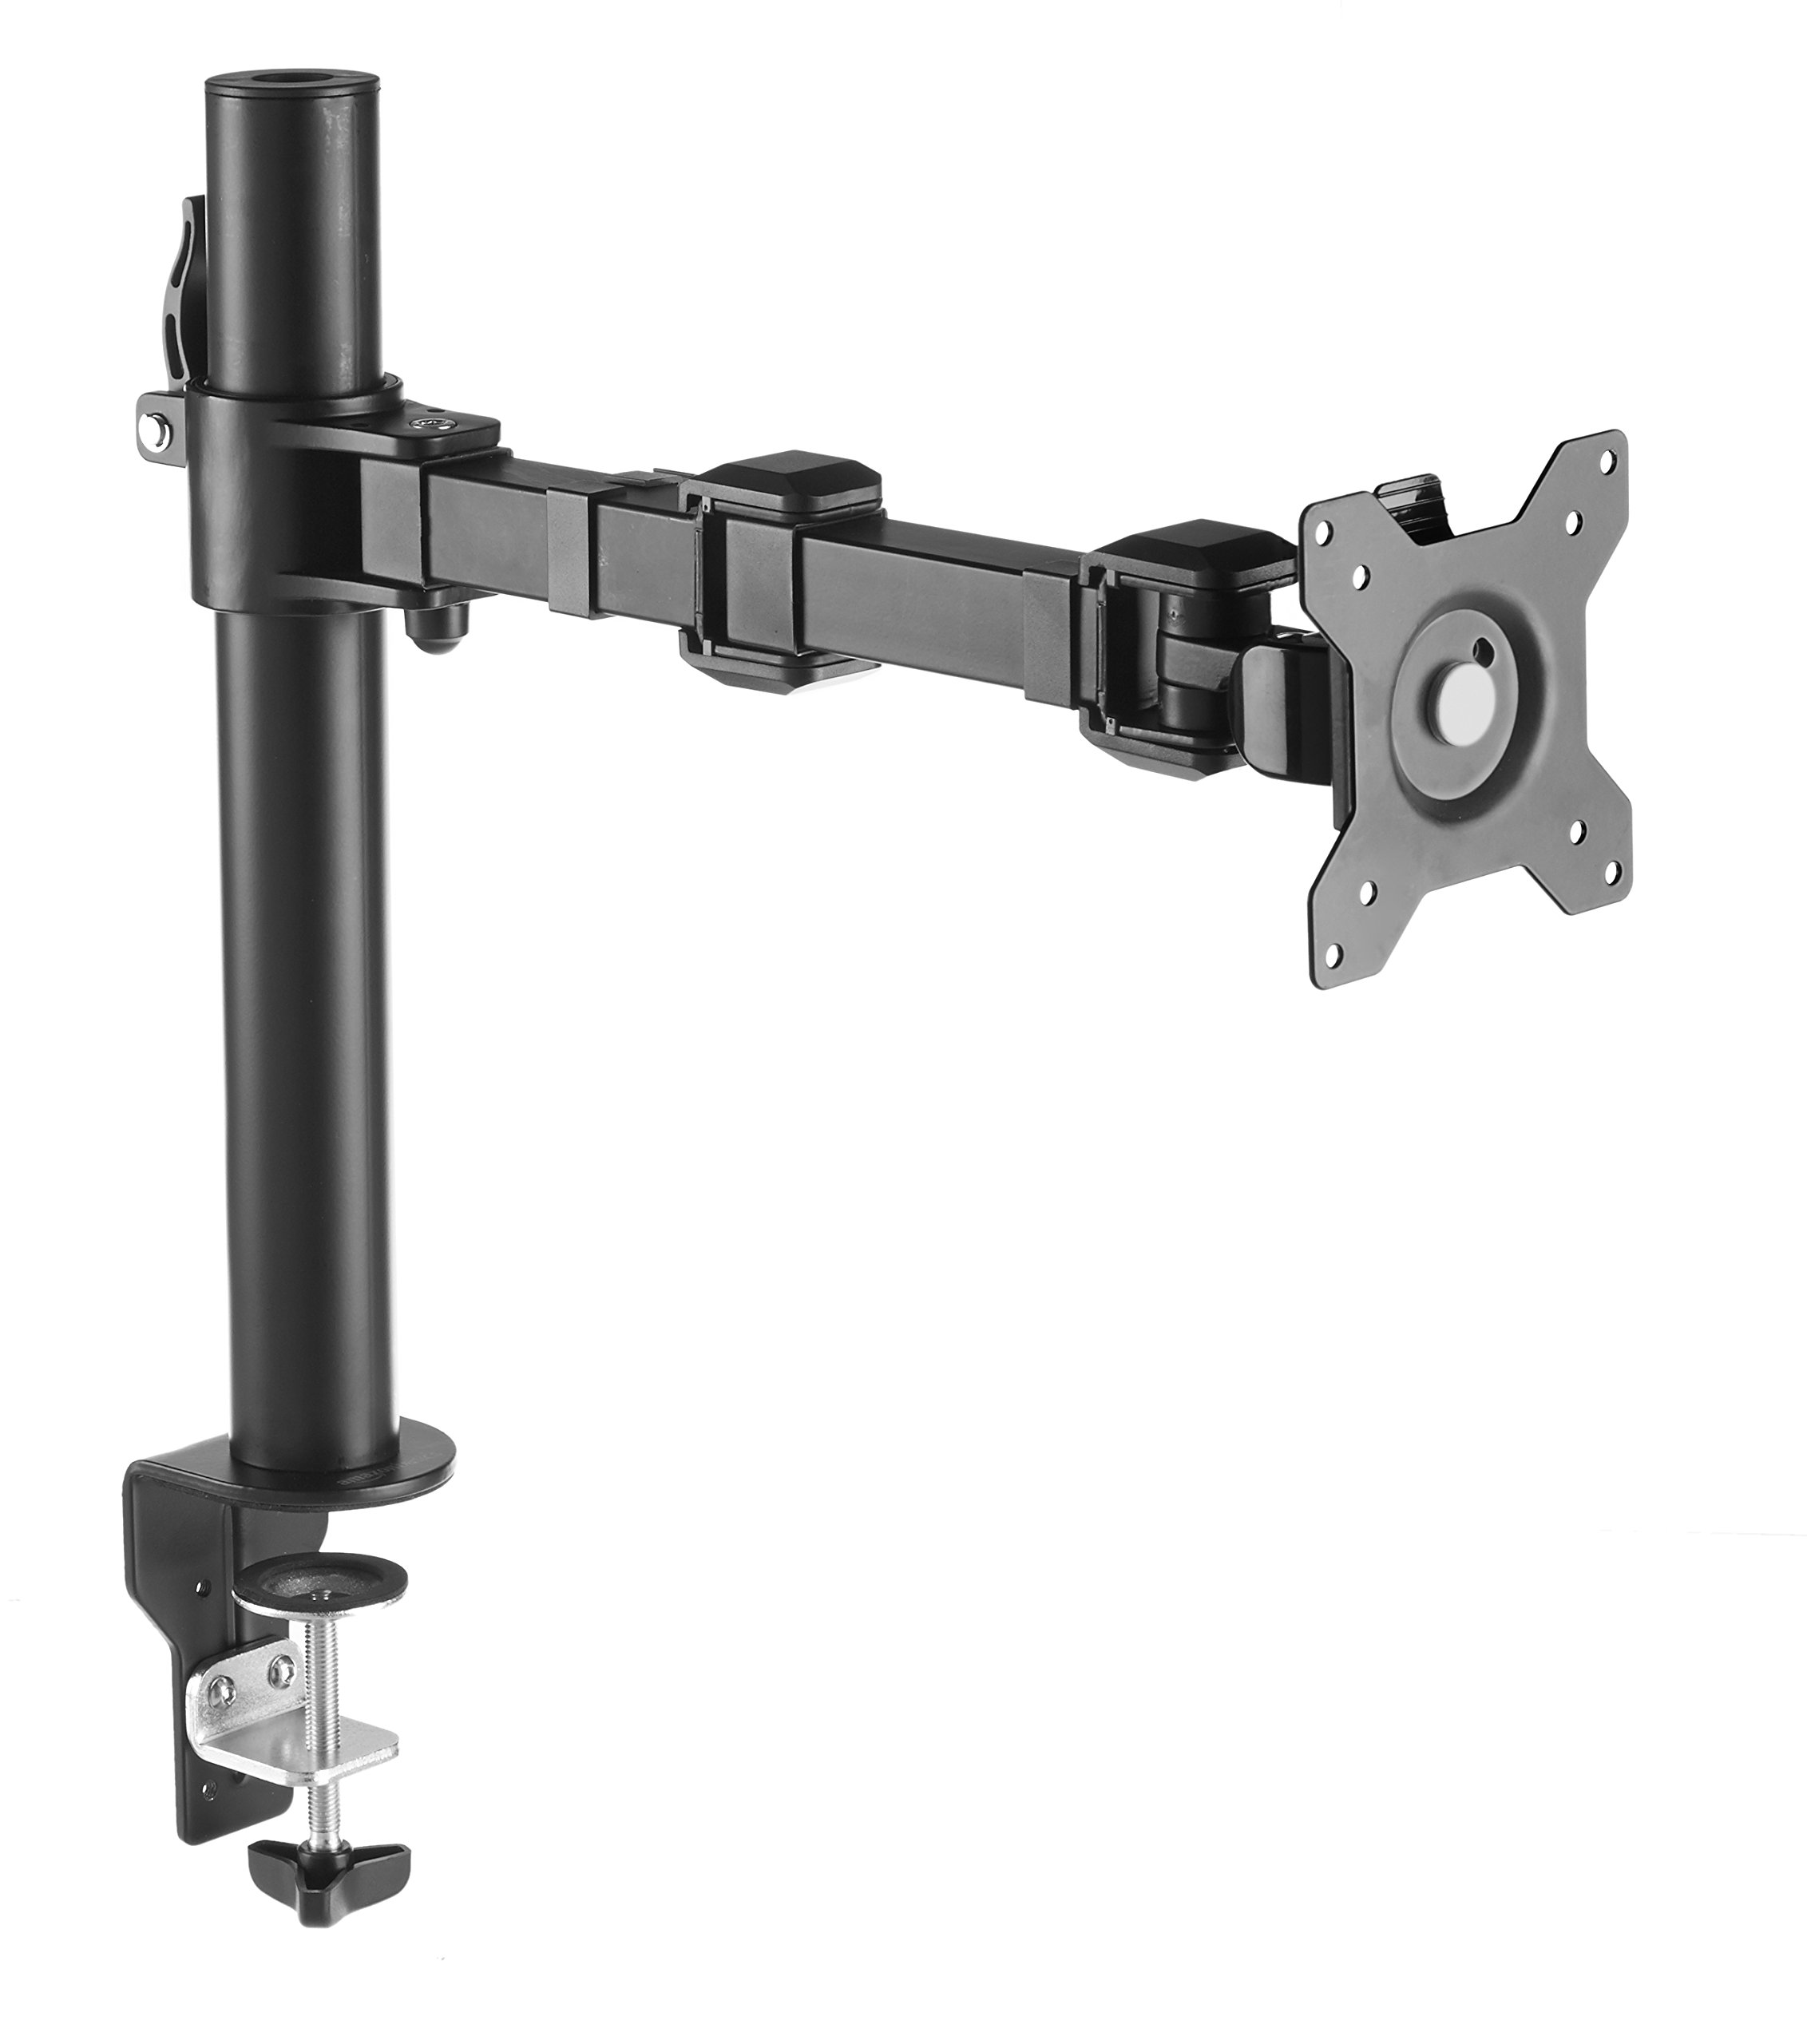 AmazonBasics Single Computer Monitor Stand - Height Adjustable Desk Arm Mount, Steel by AmazonBasics